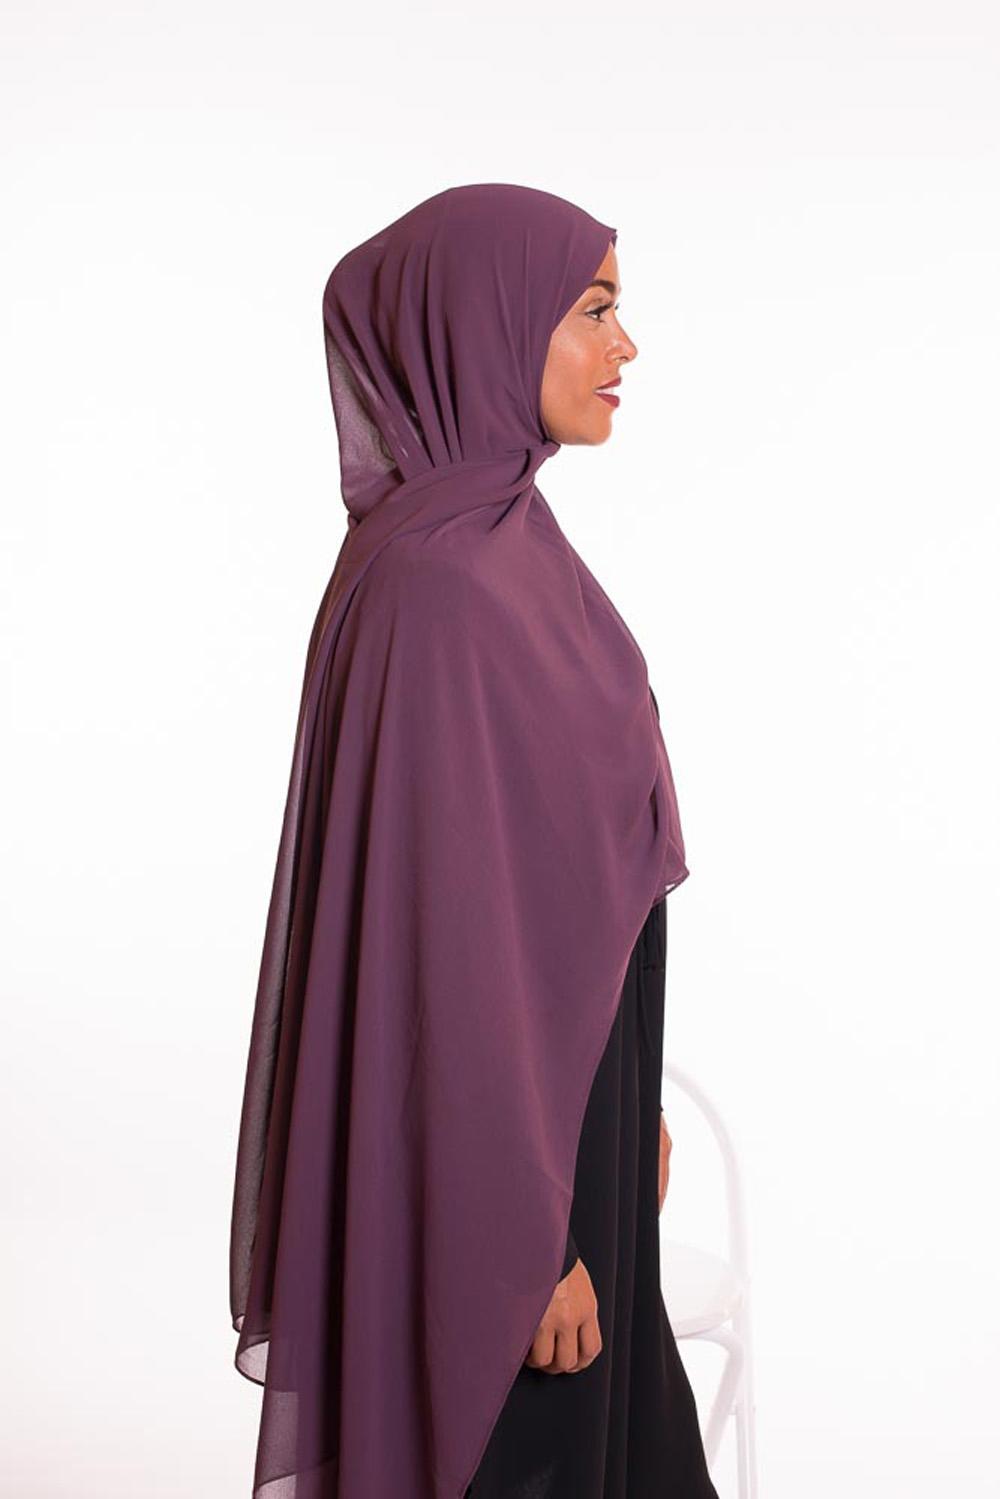 hijab xxl mousseline aubergine